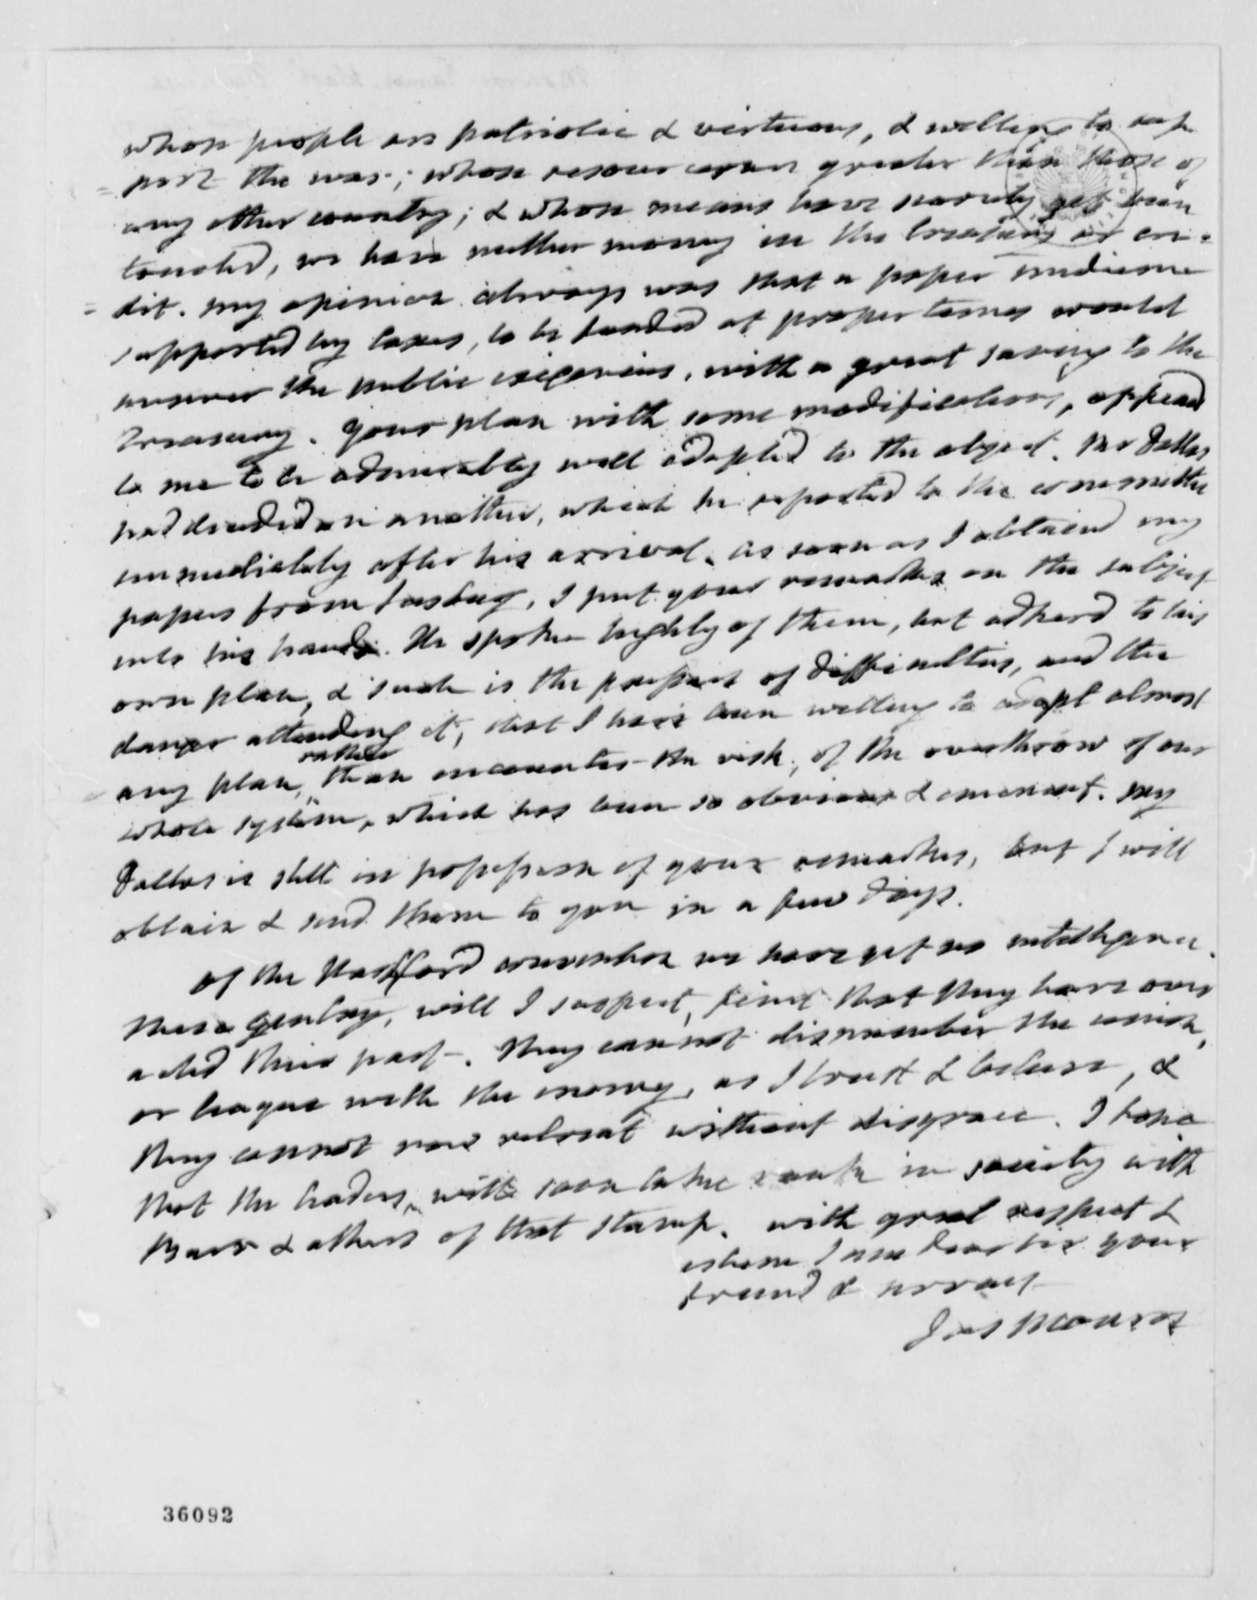 James Monroe to Thomas Jefferson, December 21, 1814